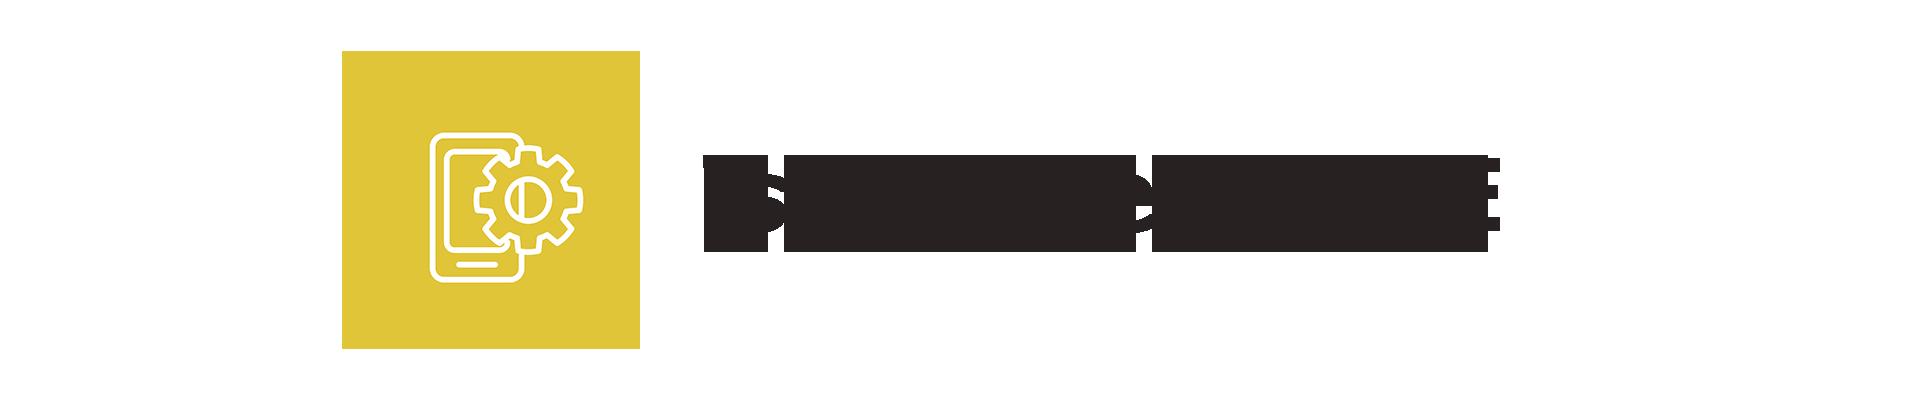 isMobile-mwt6.png